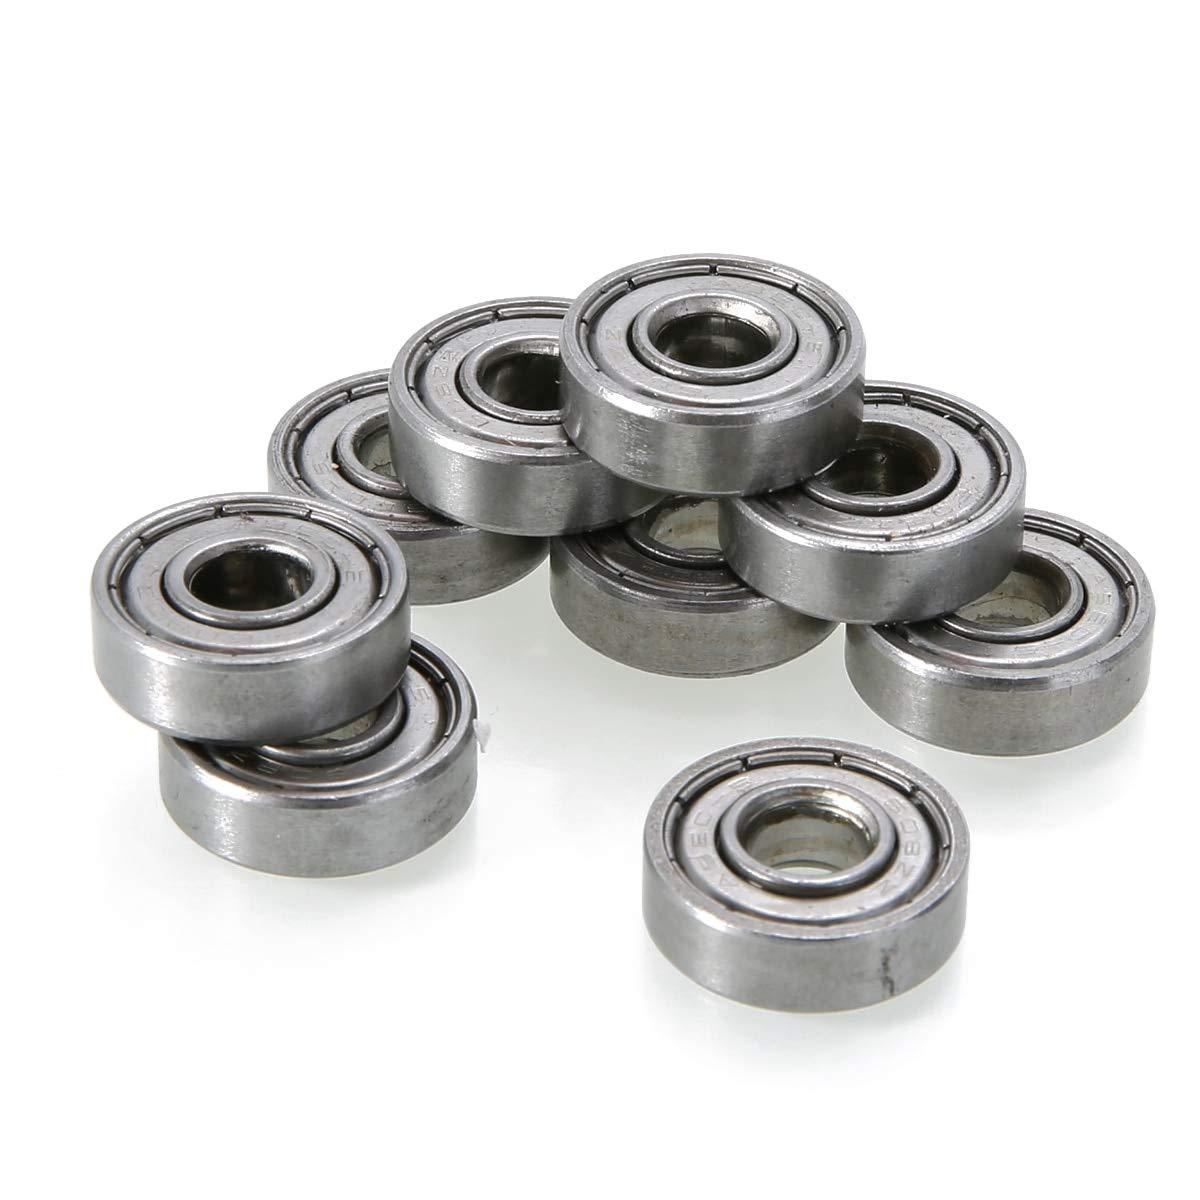 10PCS 608zz Deep Groove Ball Bearing Carbon Steel For Skateboard Roller Blade